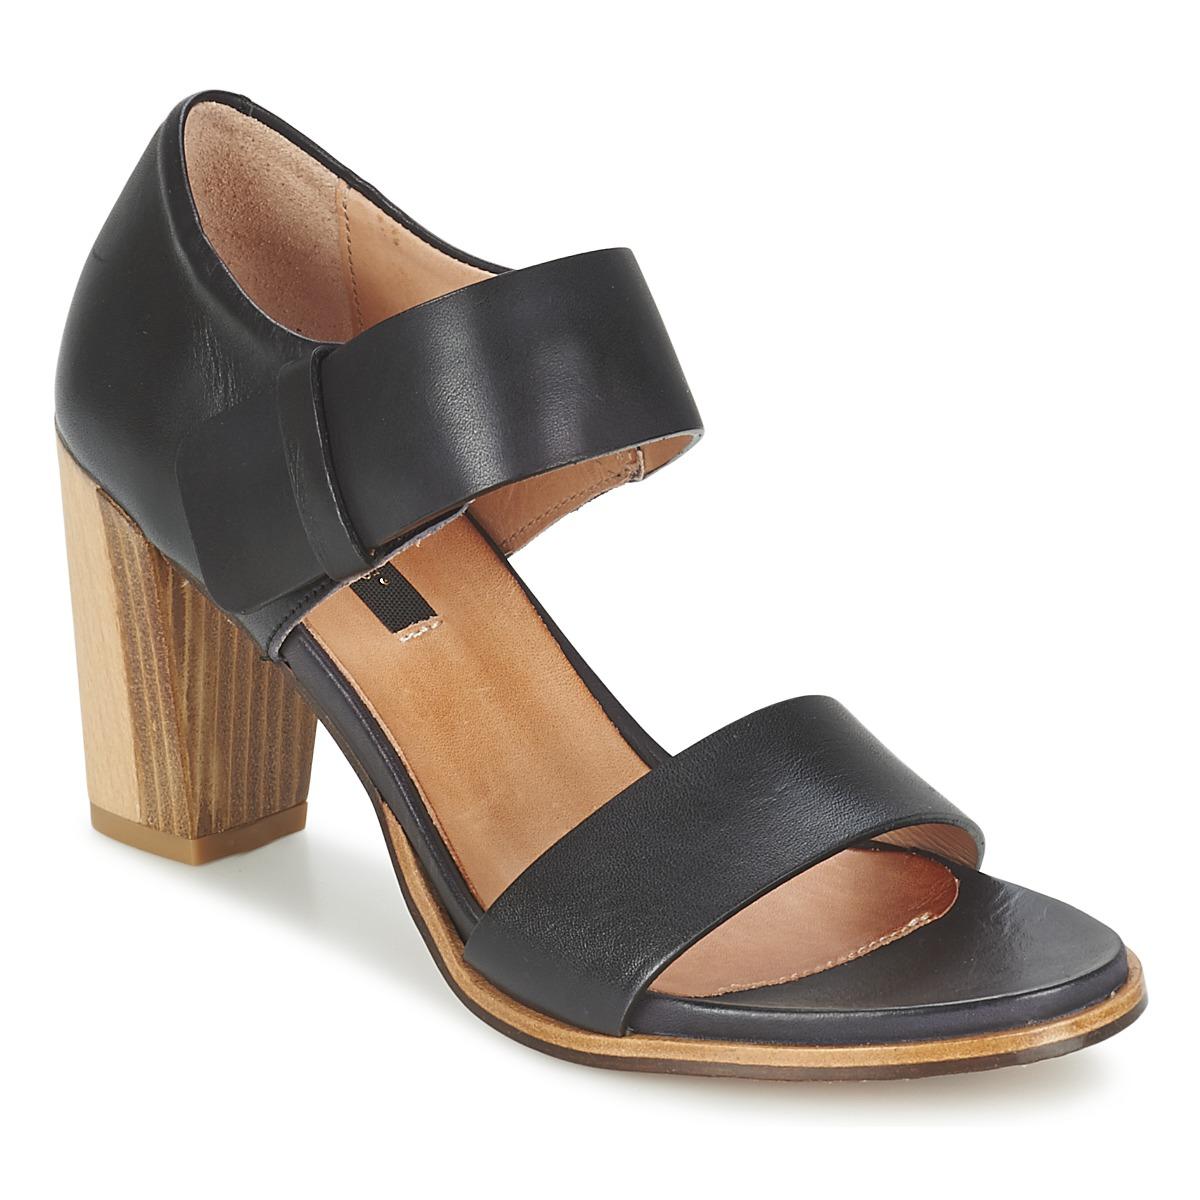 Sandale Neosens GLORIA 198 Noir